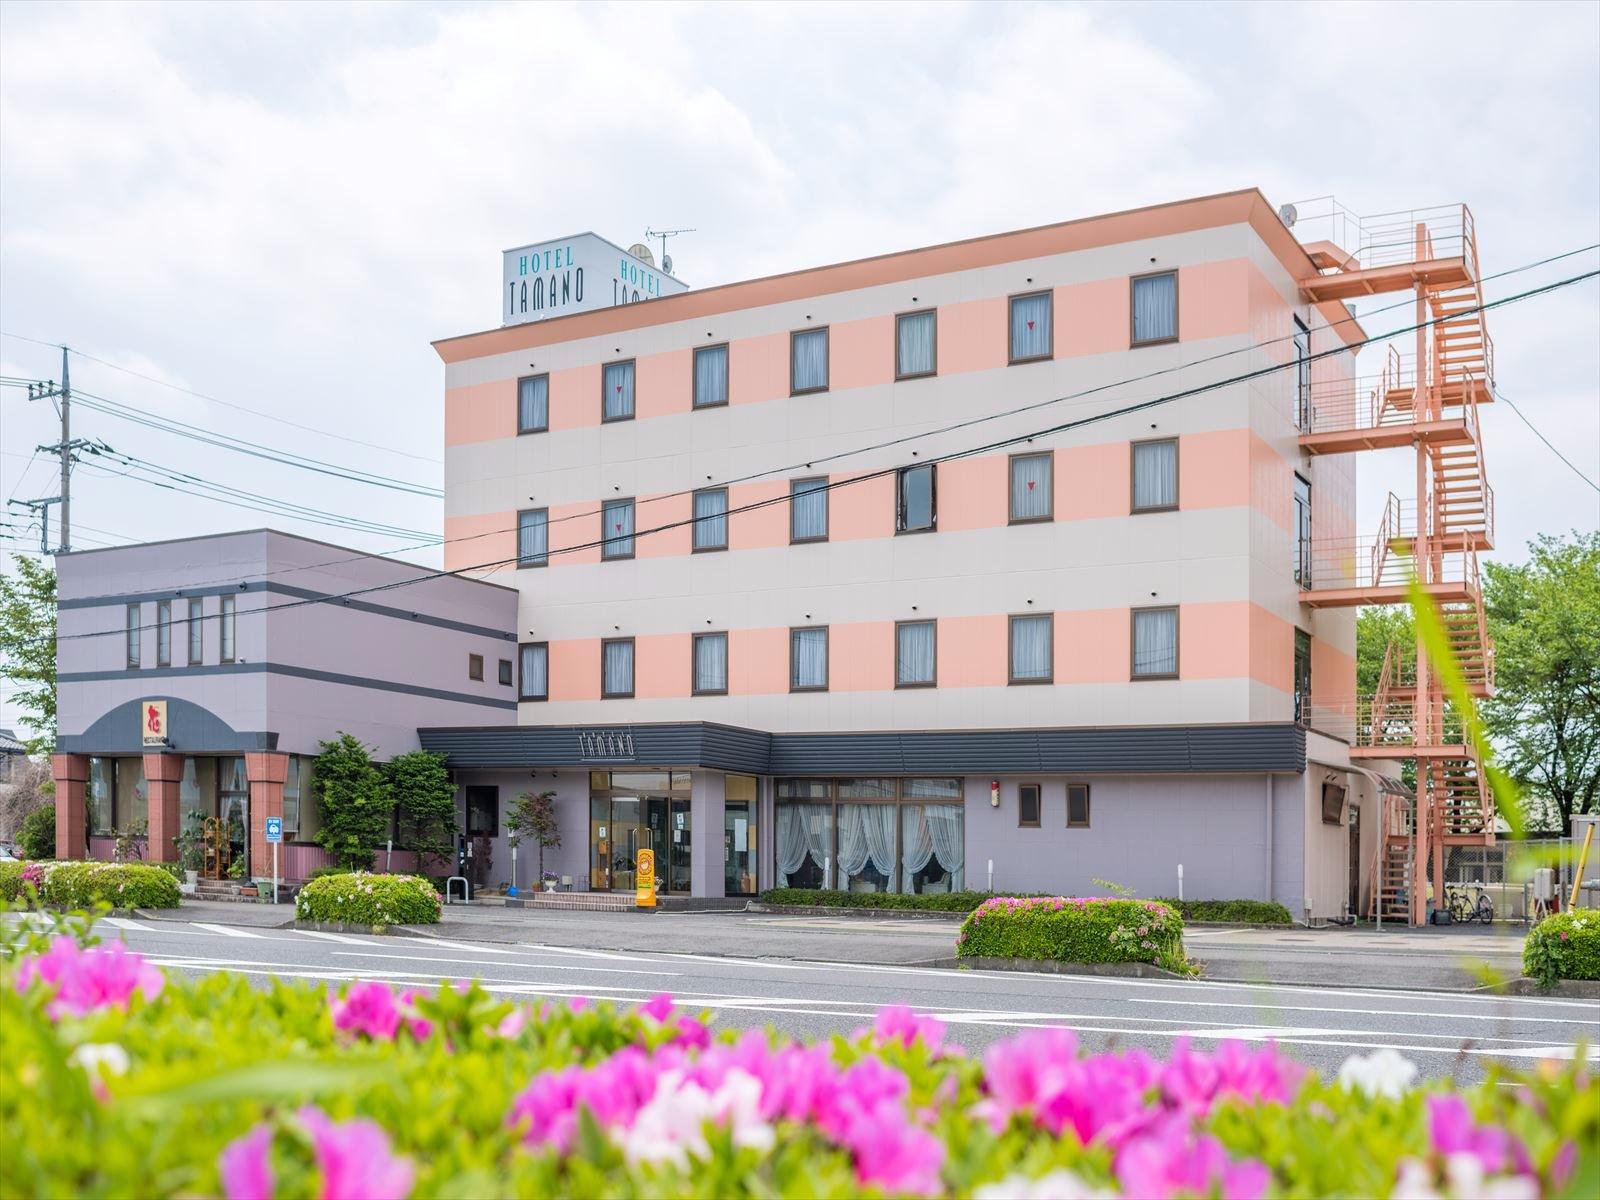 Hotel Tamano